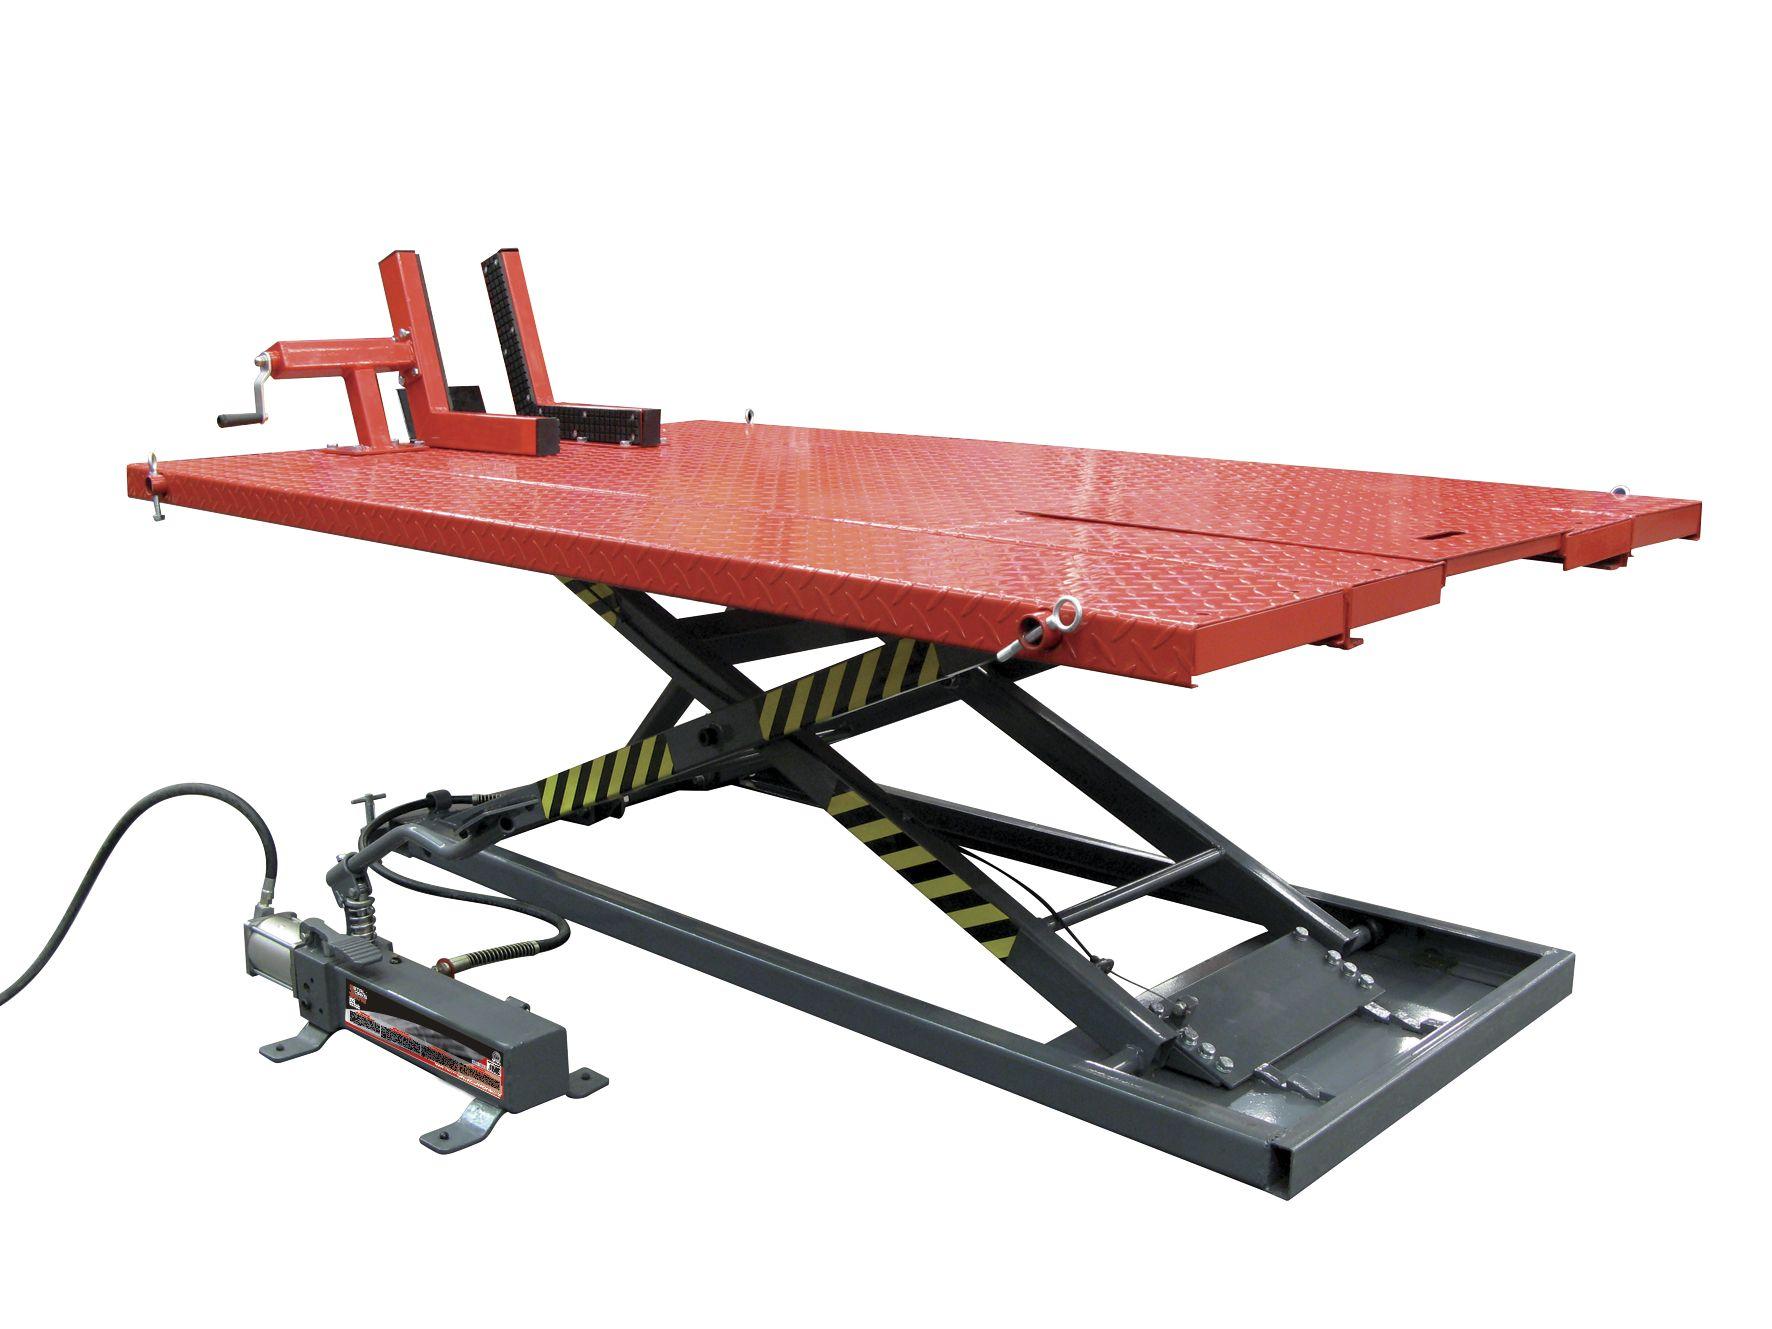 tpsl700 heftafels en hefbruggen hydraulische werkplaatsuitrusting vynckier tools. Black Bedroom Furniture Sets. Home Design Ideas